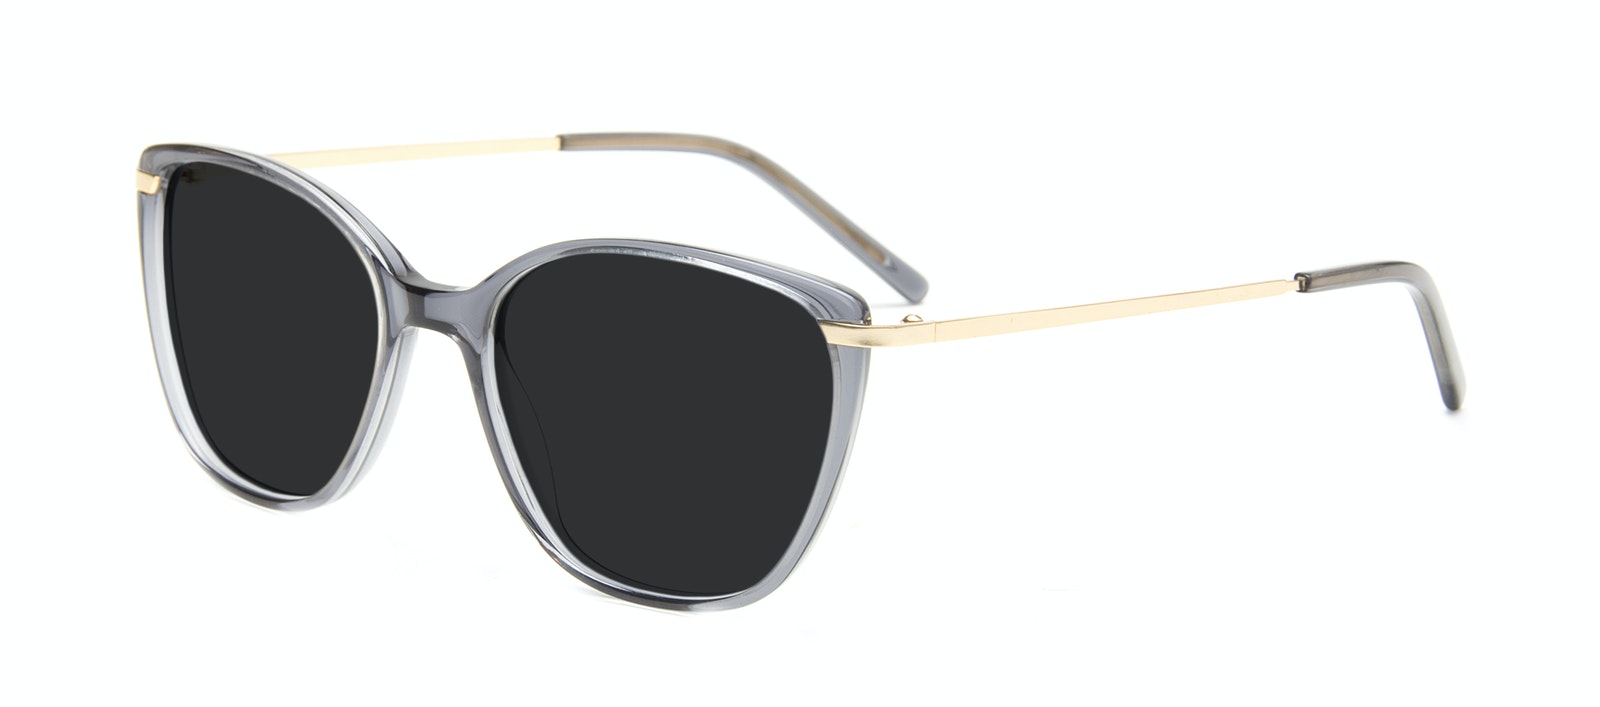 Affordable Fashion Glasses Cat Eye Rectangle Square Sunglasses Women Illusion Gold Shadow Tilt